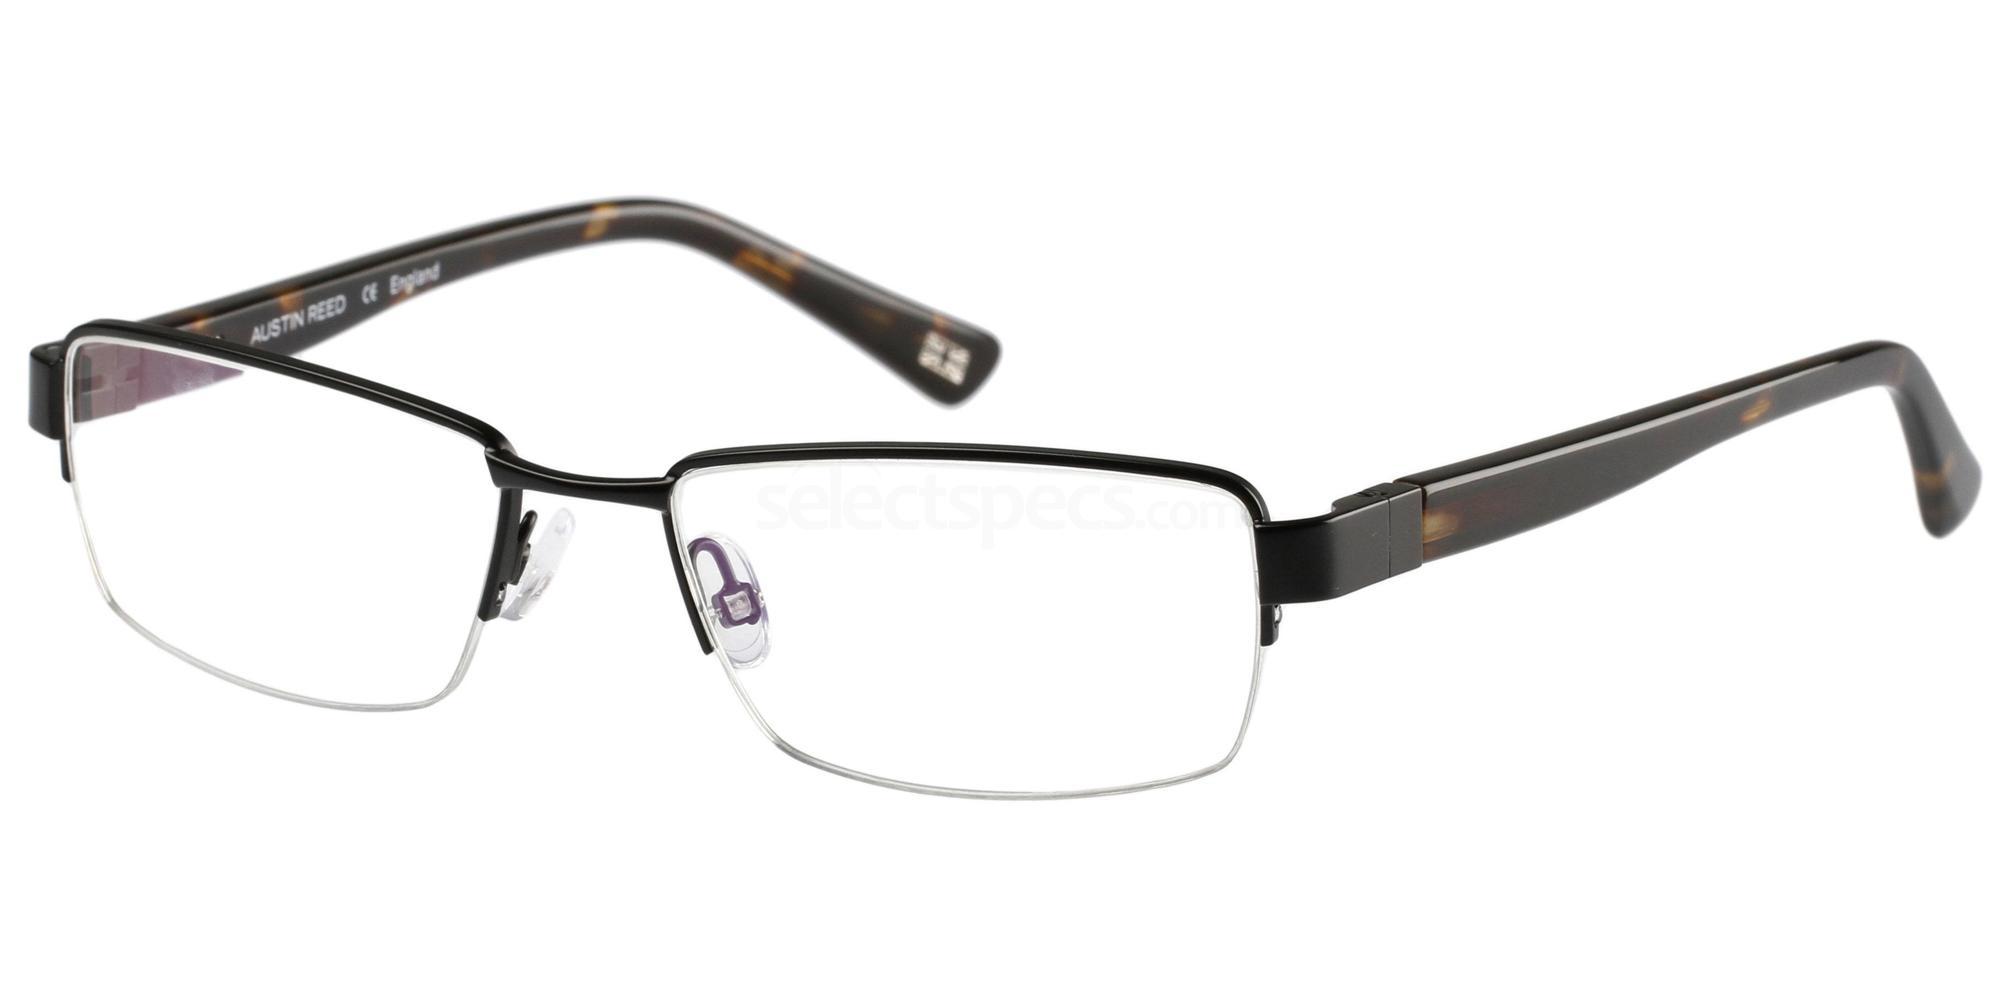 004 AR-M08 Portman Glasses, Austin Reed